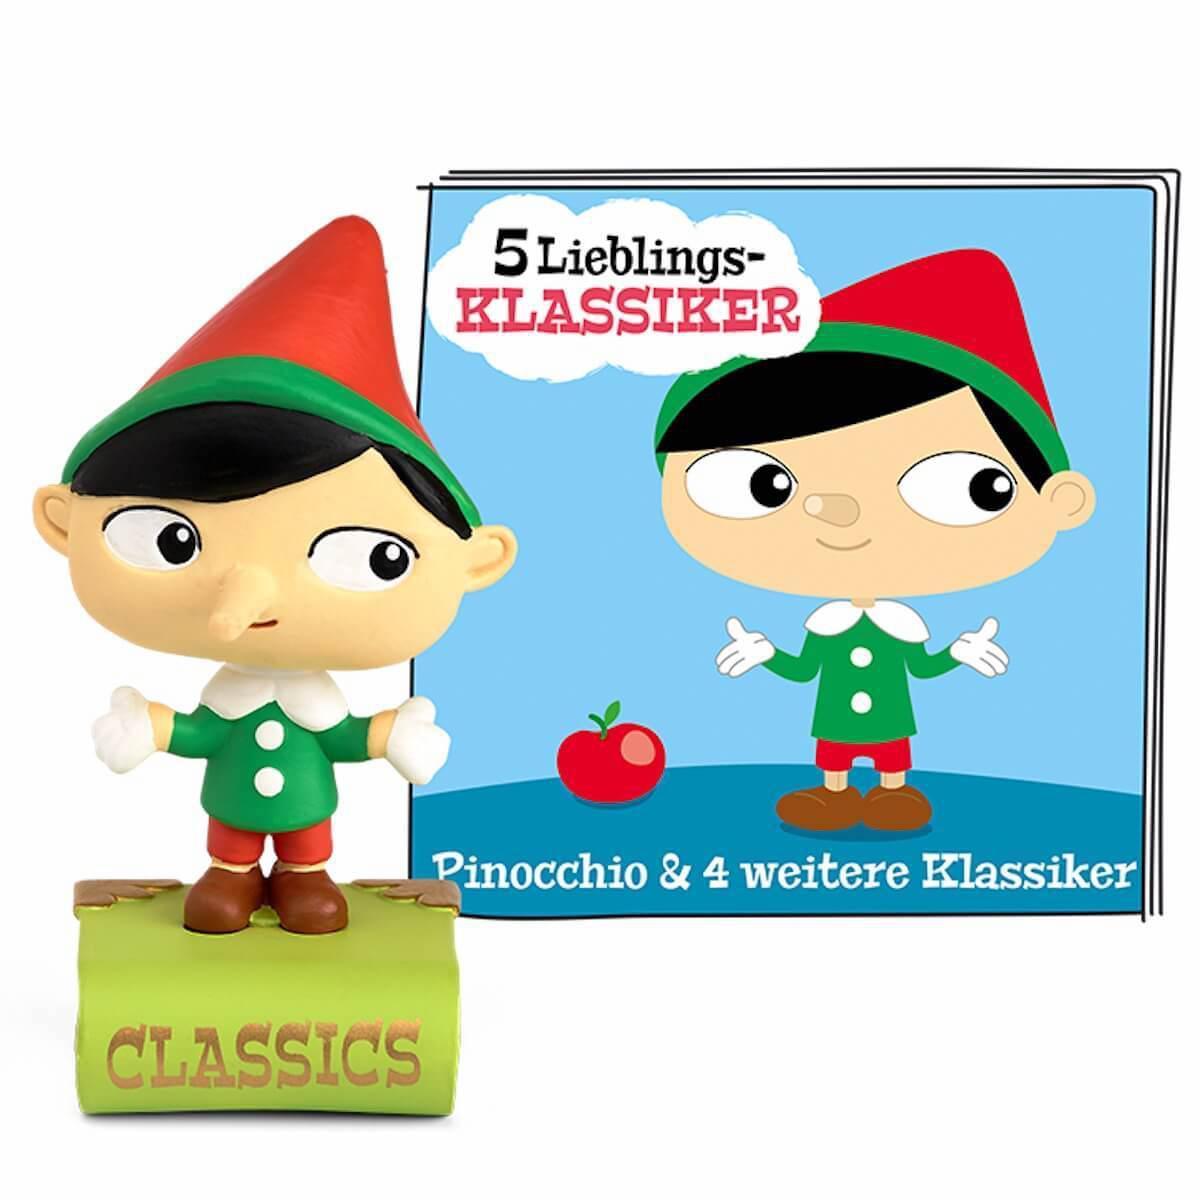 Hörspielfigur TONIES 5 Lieblings-Klassiker- Pinocchio u.a.